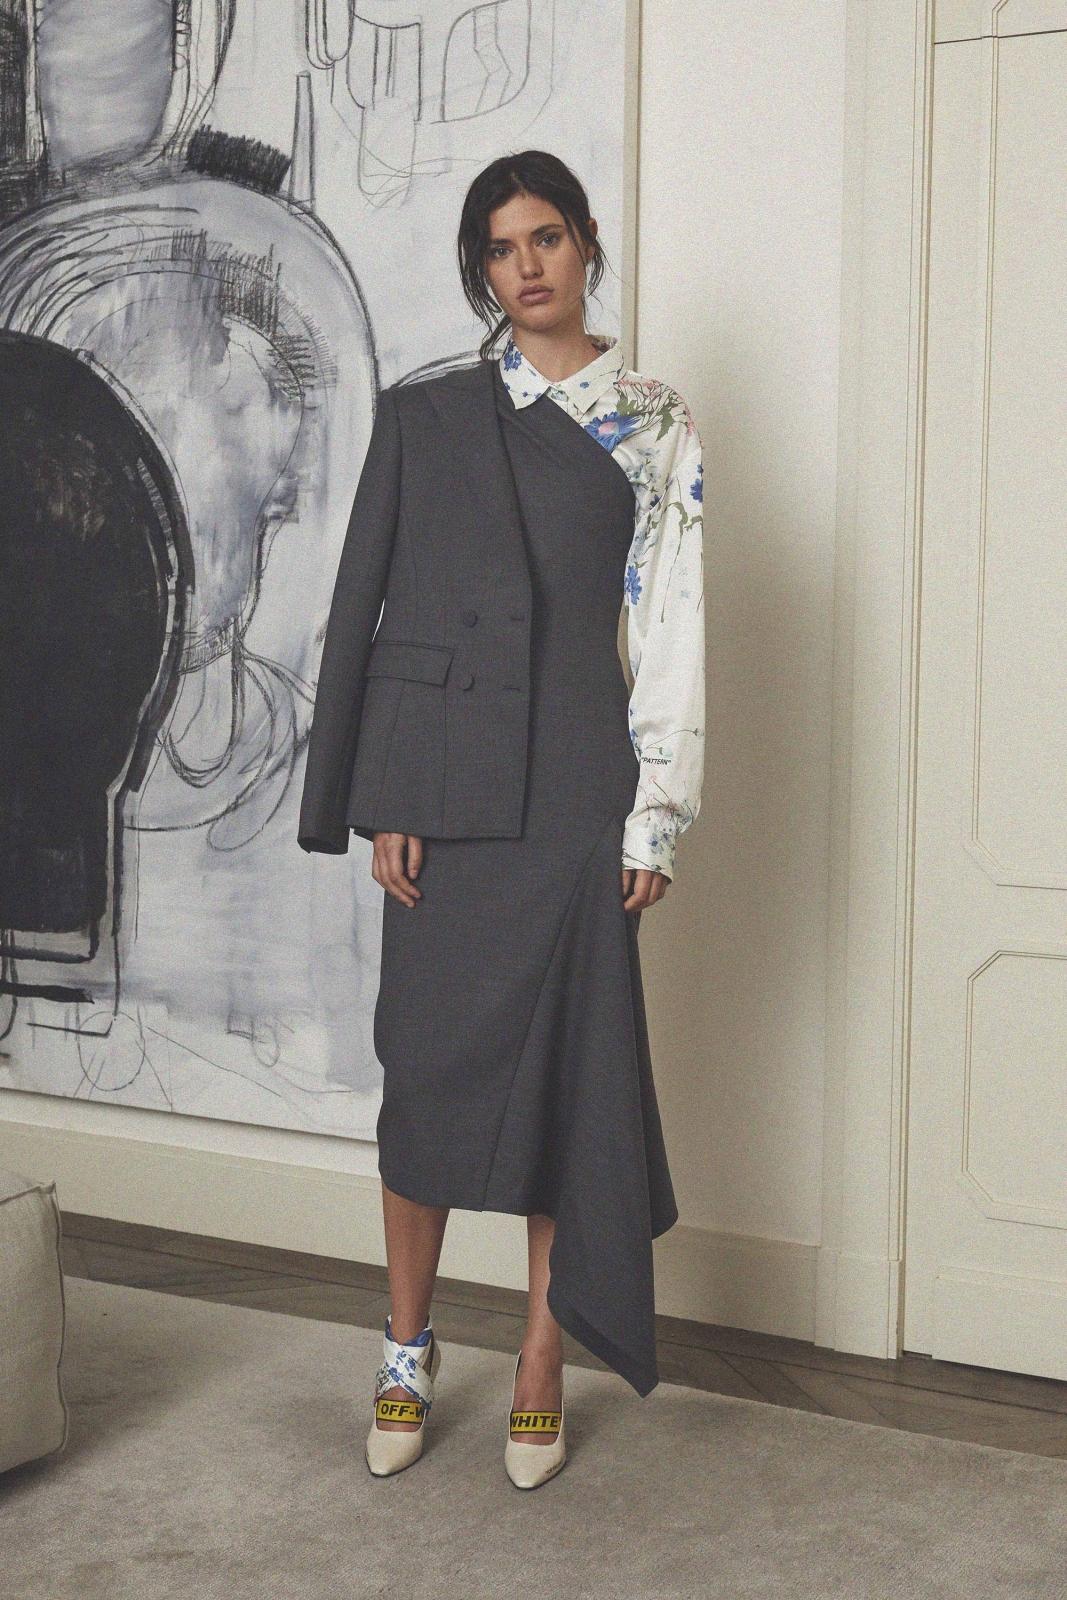 331a3a0b6e3b Louis Vuitton Names Virgil Abloh as Its New Men s Wear Designer. Off-White  collection. Off-White accessories. Off-White collection. Off-White  collection